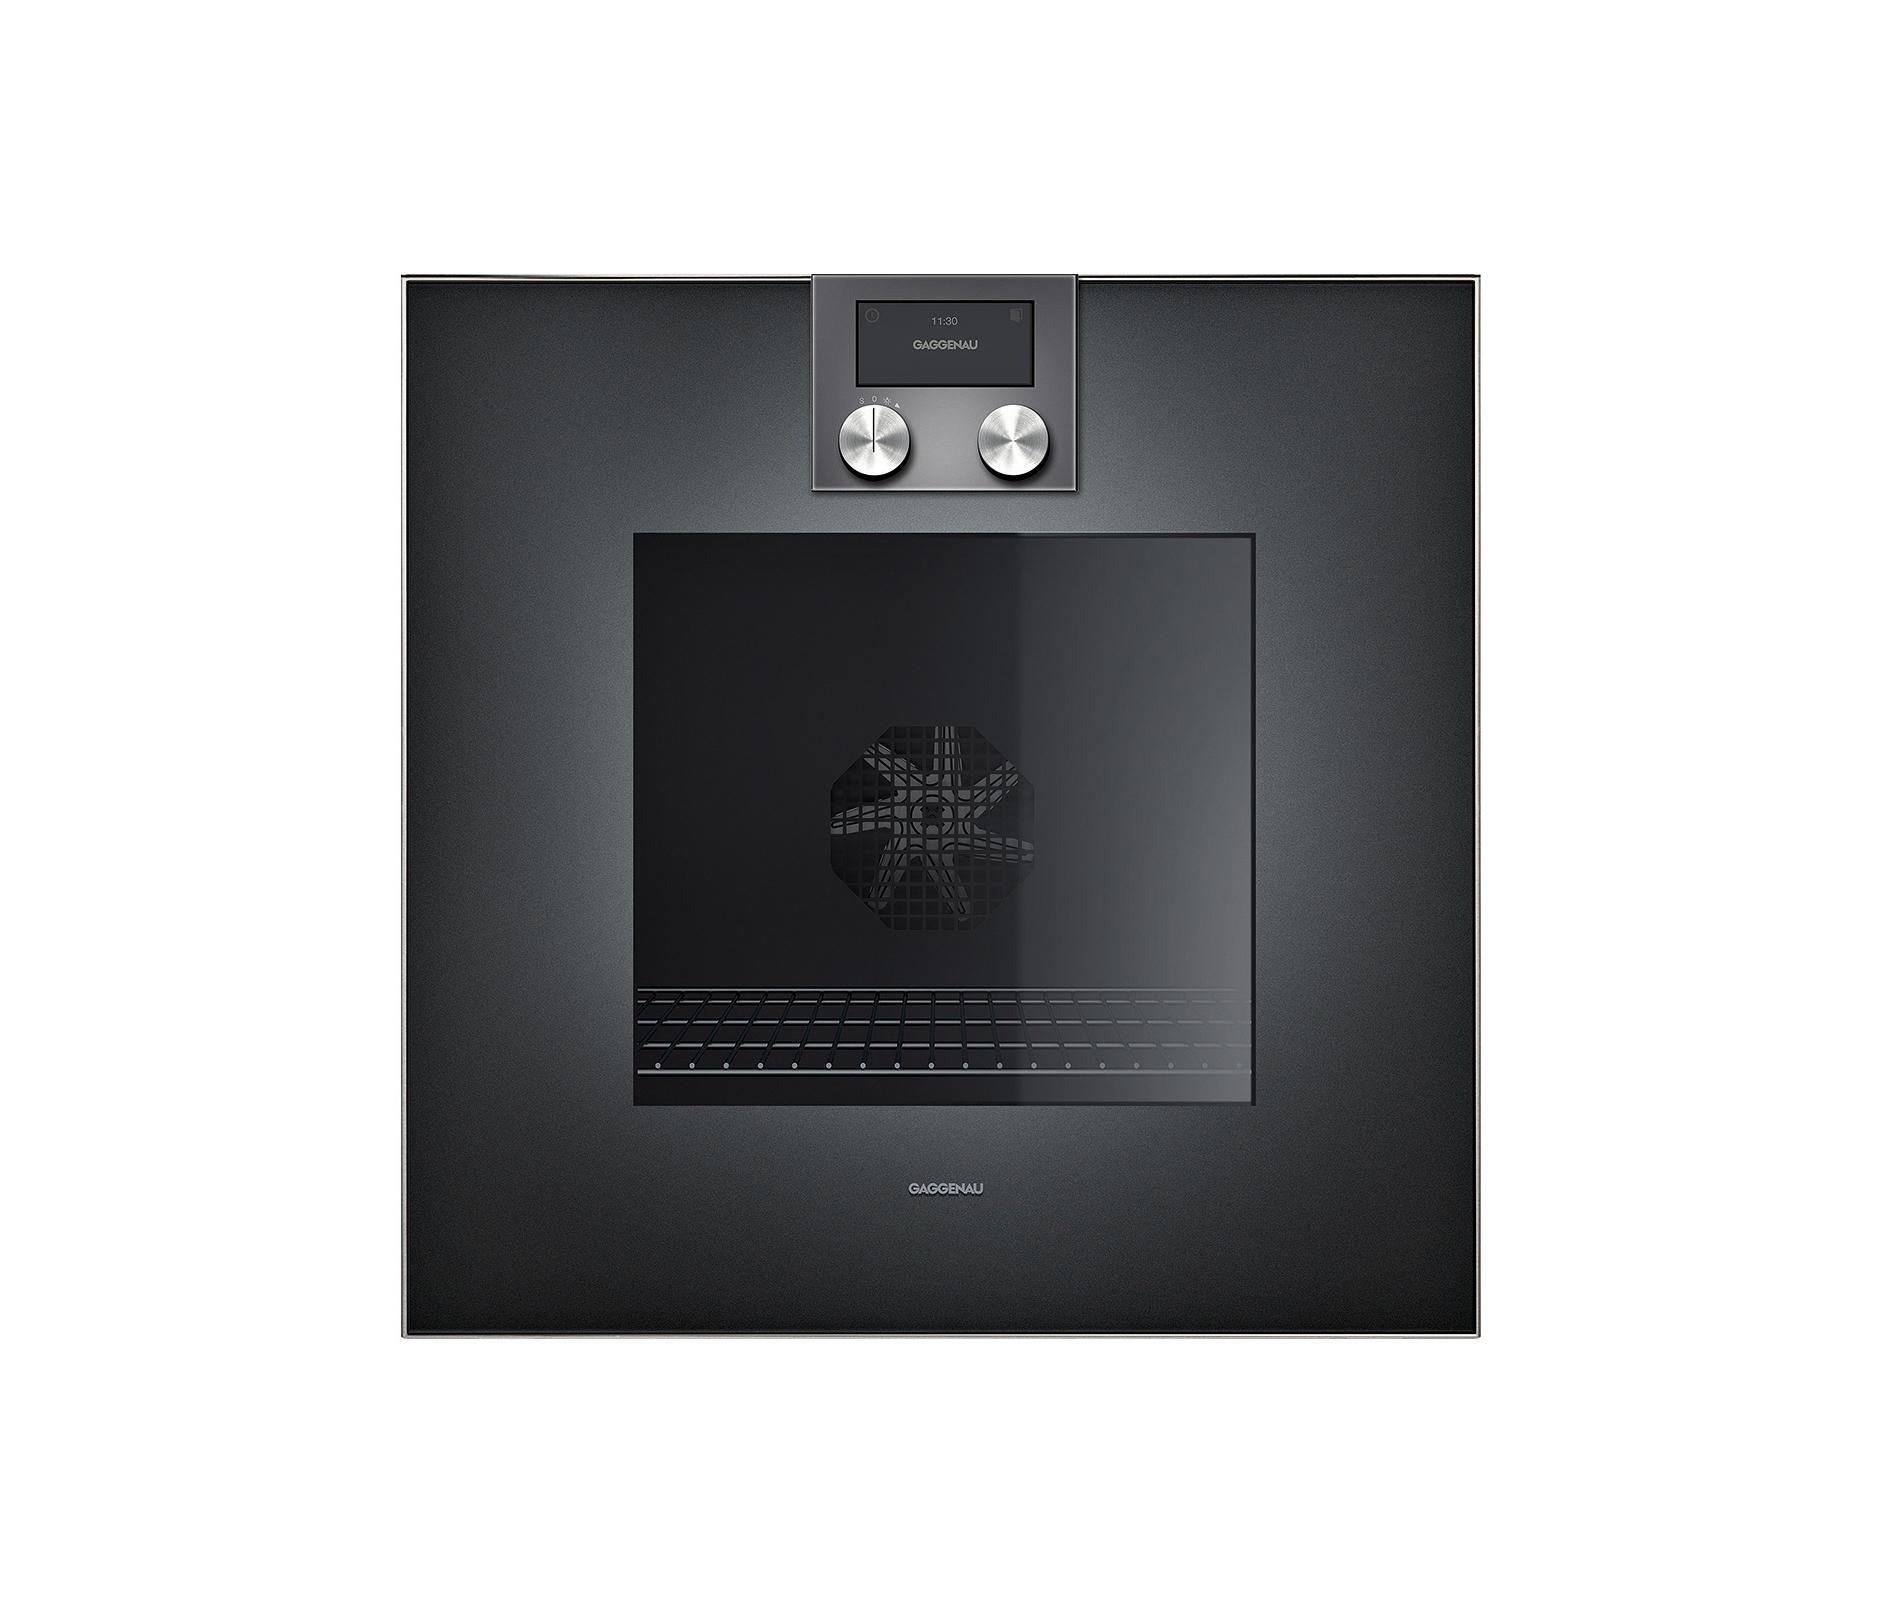 oven 400 series bo 470 bo 471 ovens from gaggenau. Black Bedroom Furniture Sets. Home Design Ideas